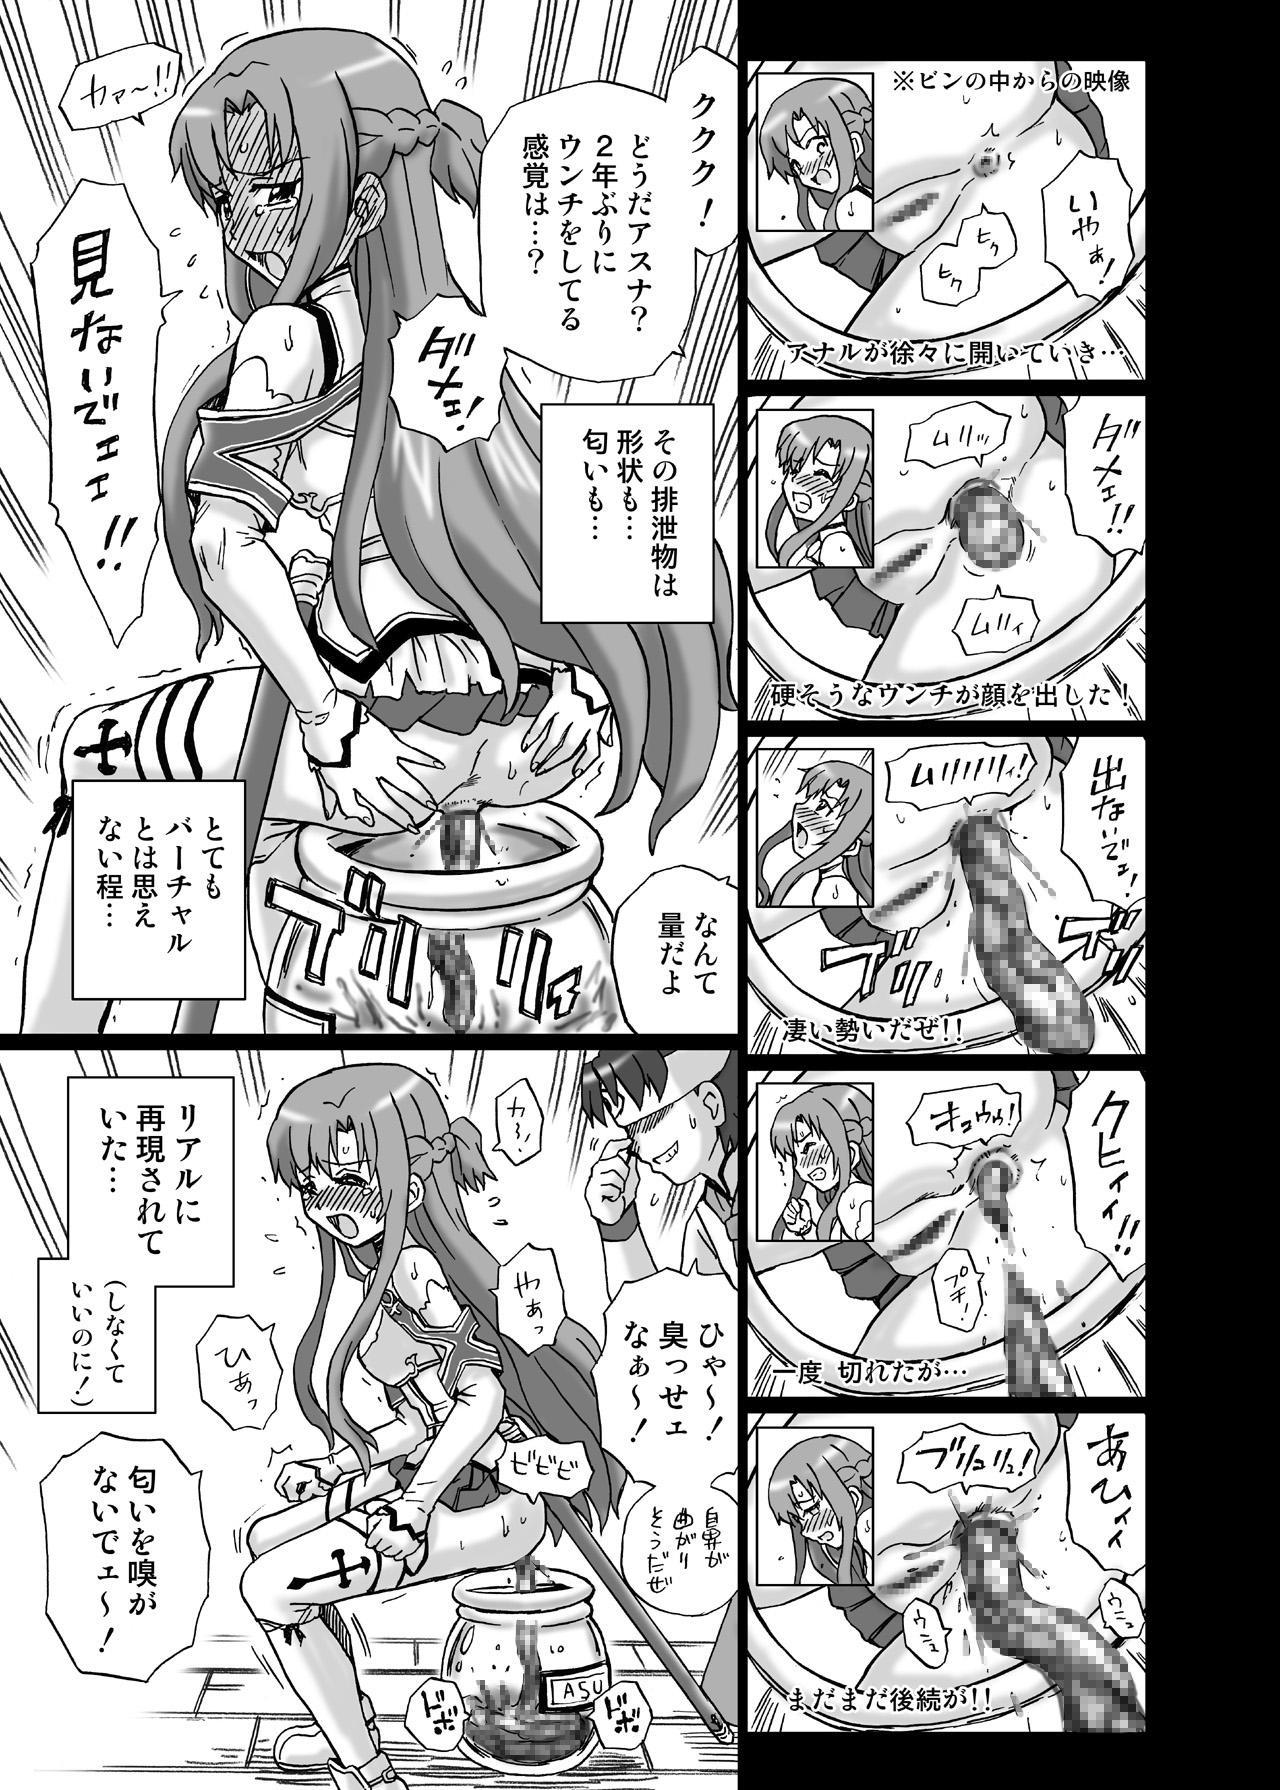 TAIL-MAN ASUNA BOOK 9